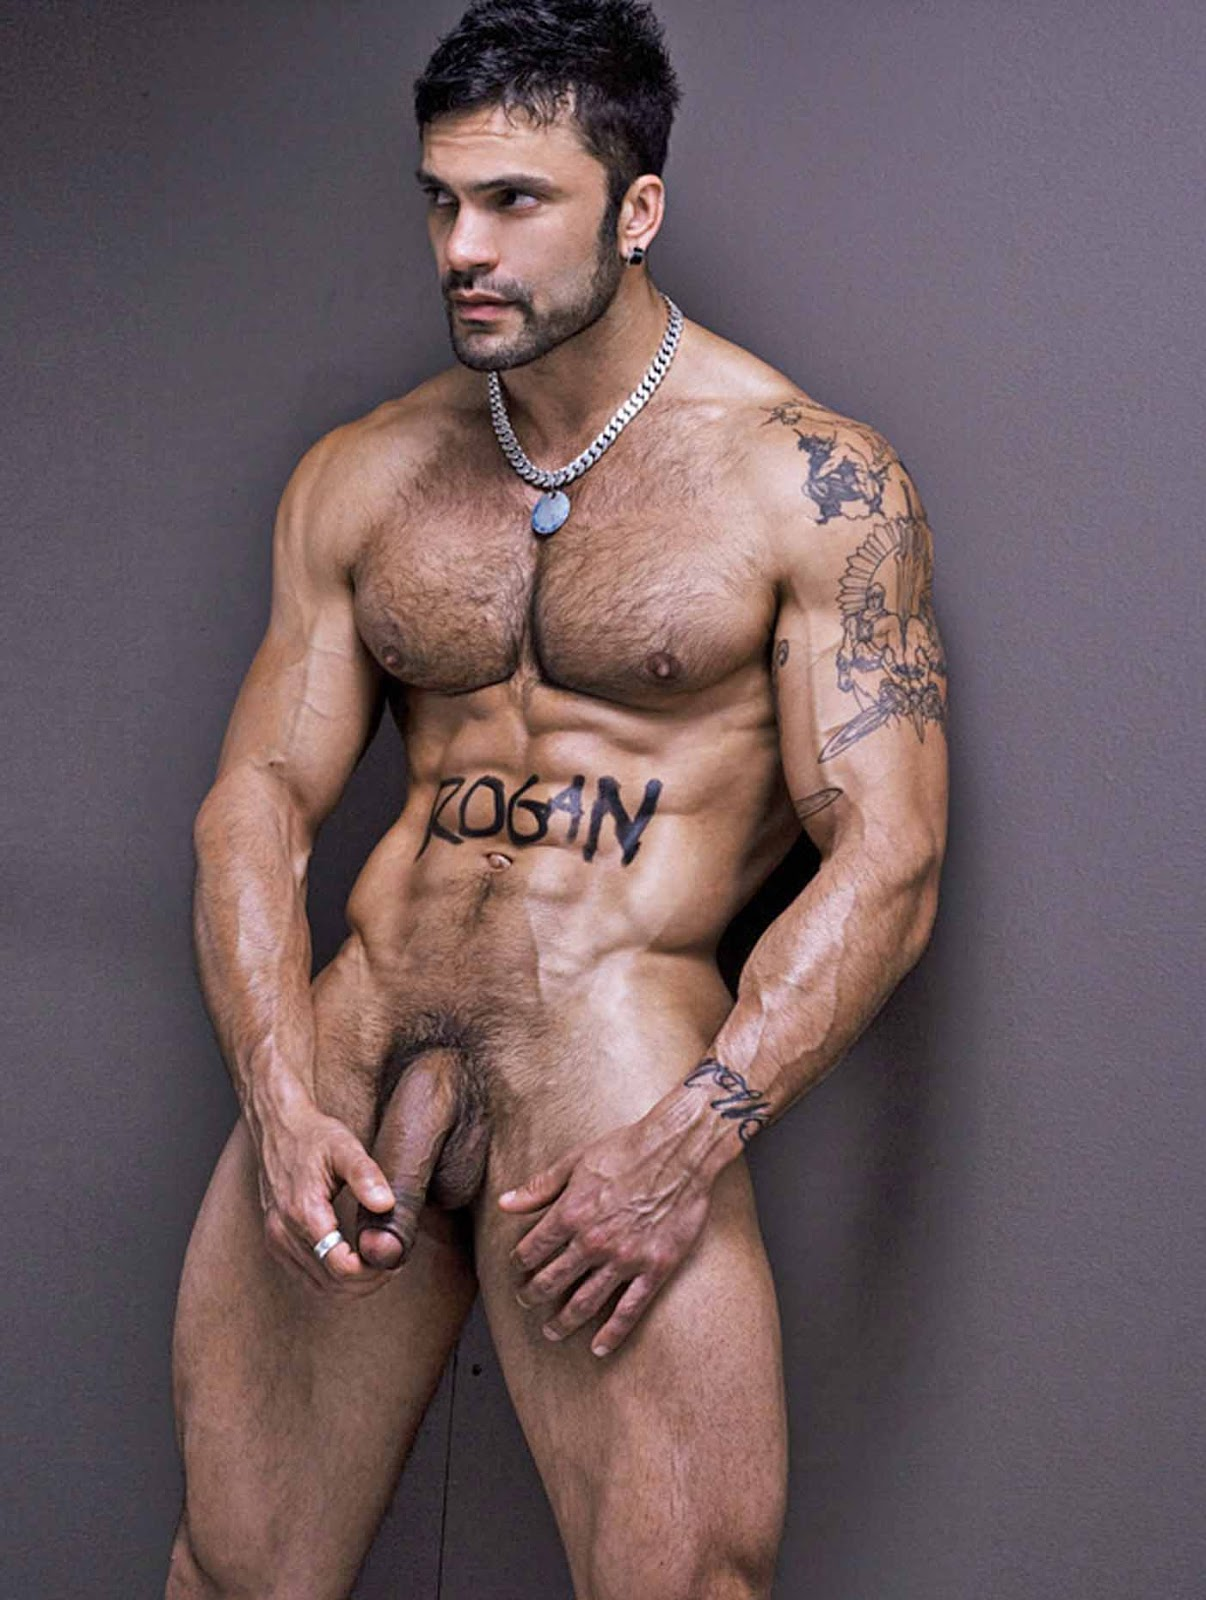 Joe Rogan Nude Pictures, Naked Scenes Reviews,